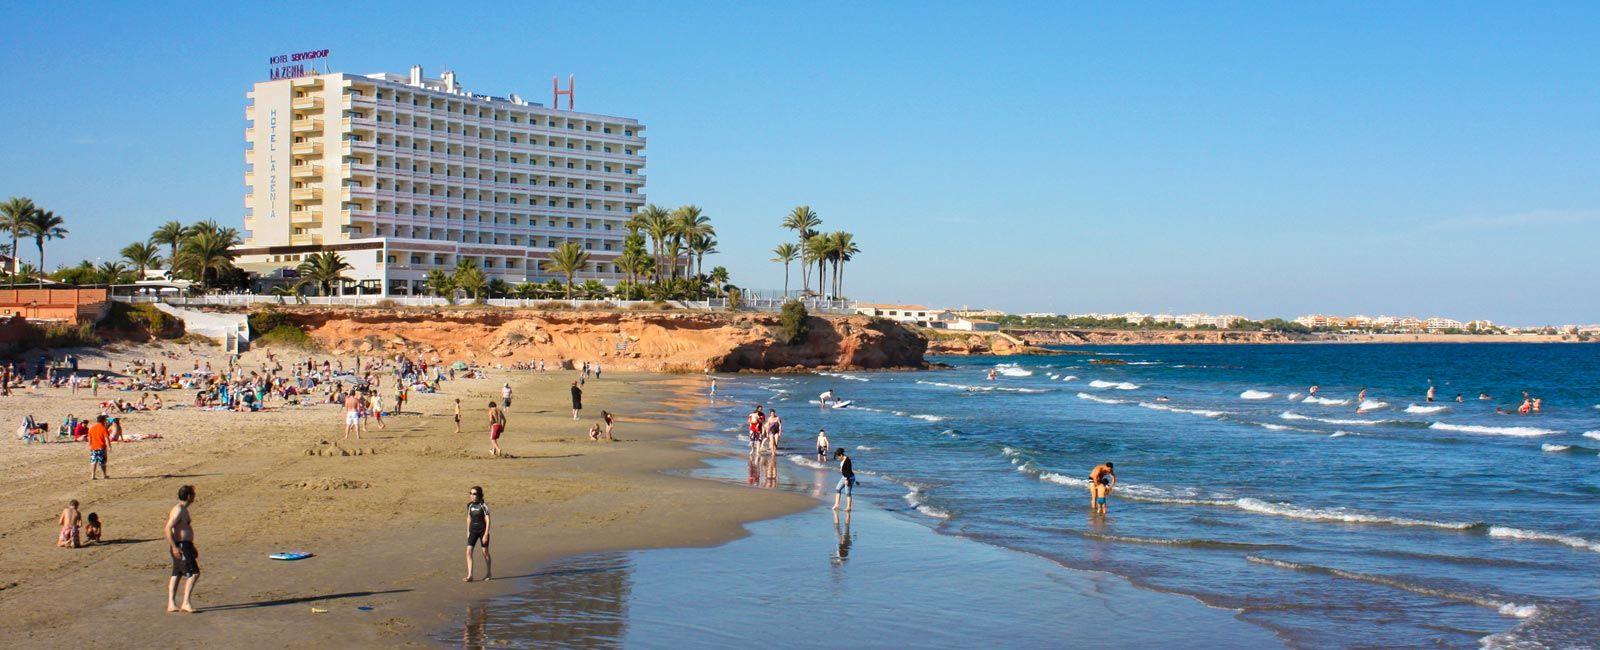 Hotel La Zenia Murcia